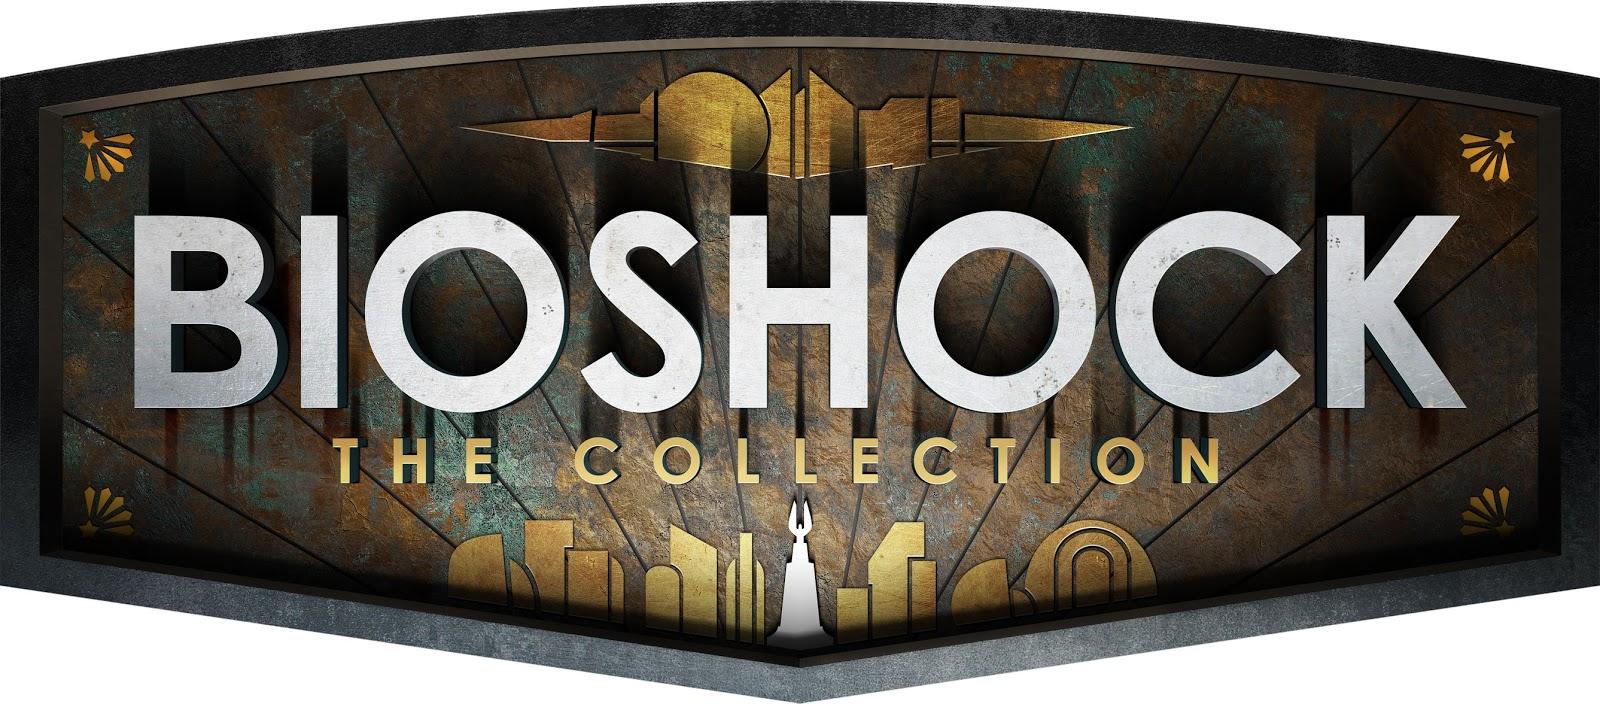 Resultado de imagem para Bioshock  The Collection logo